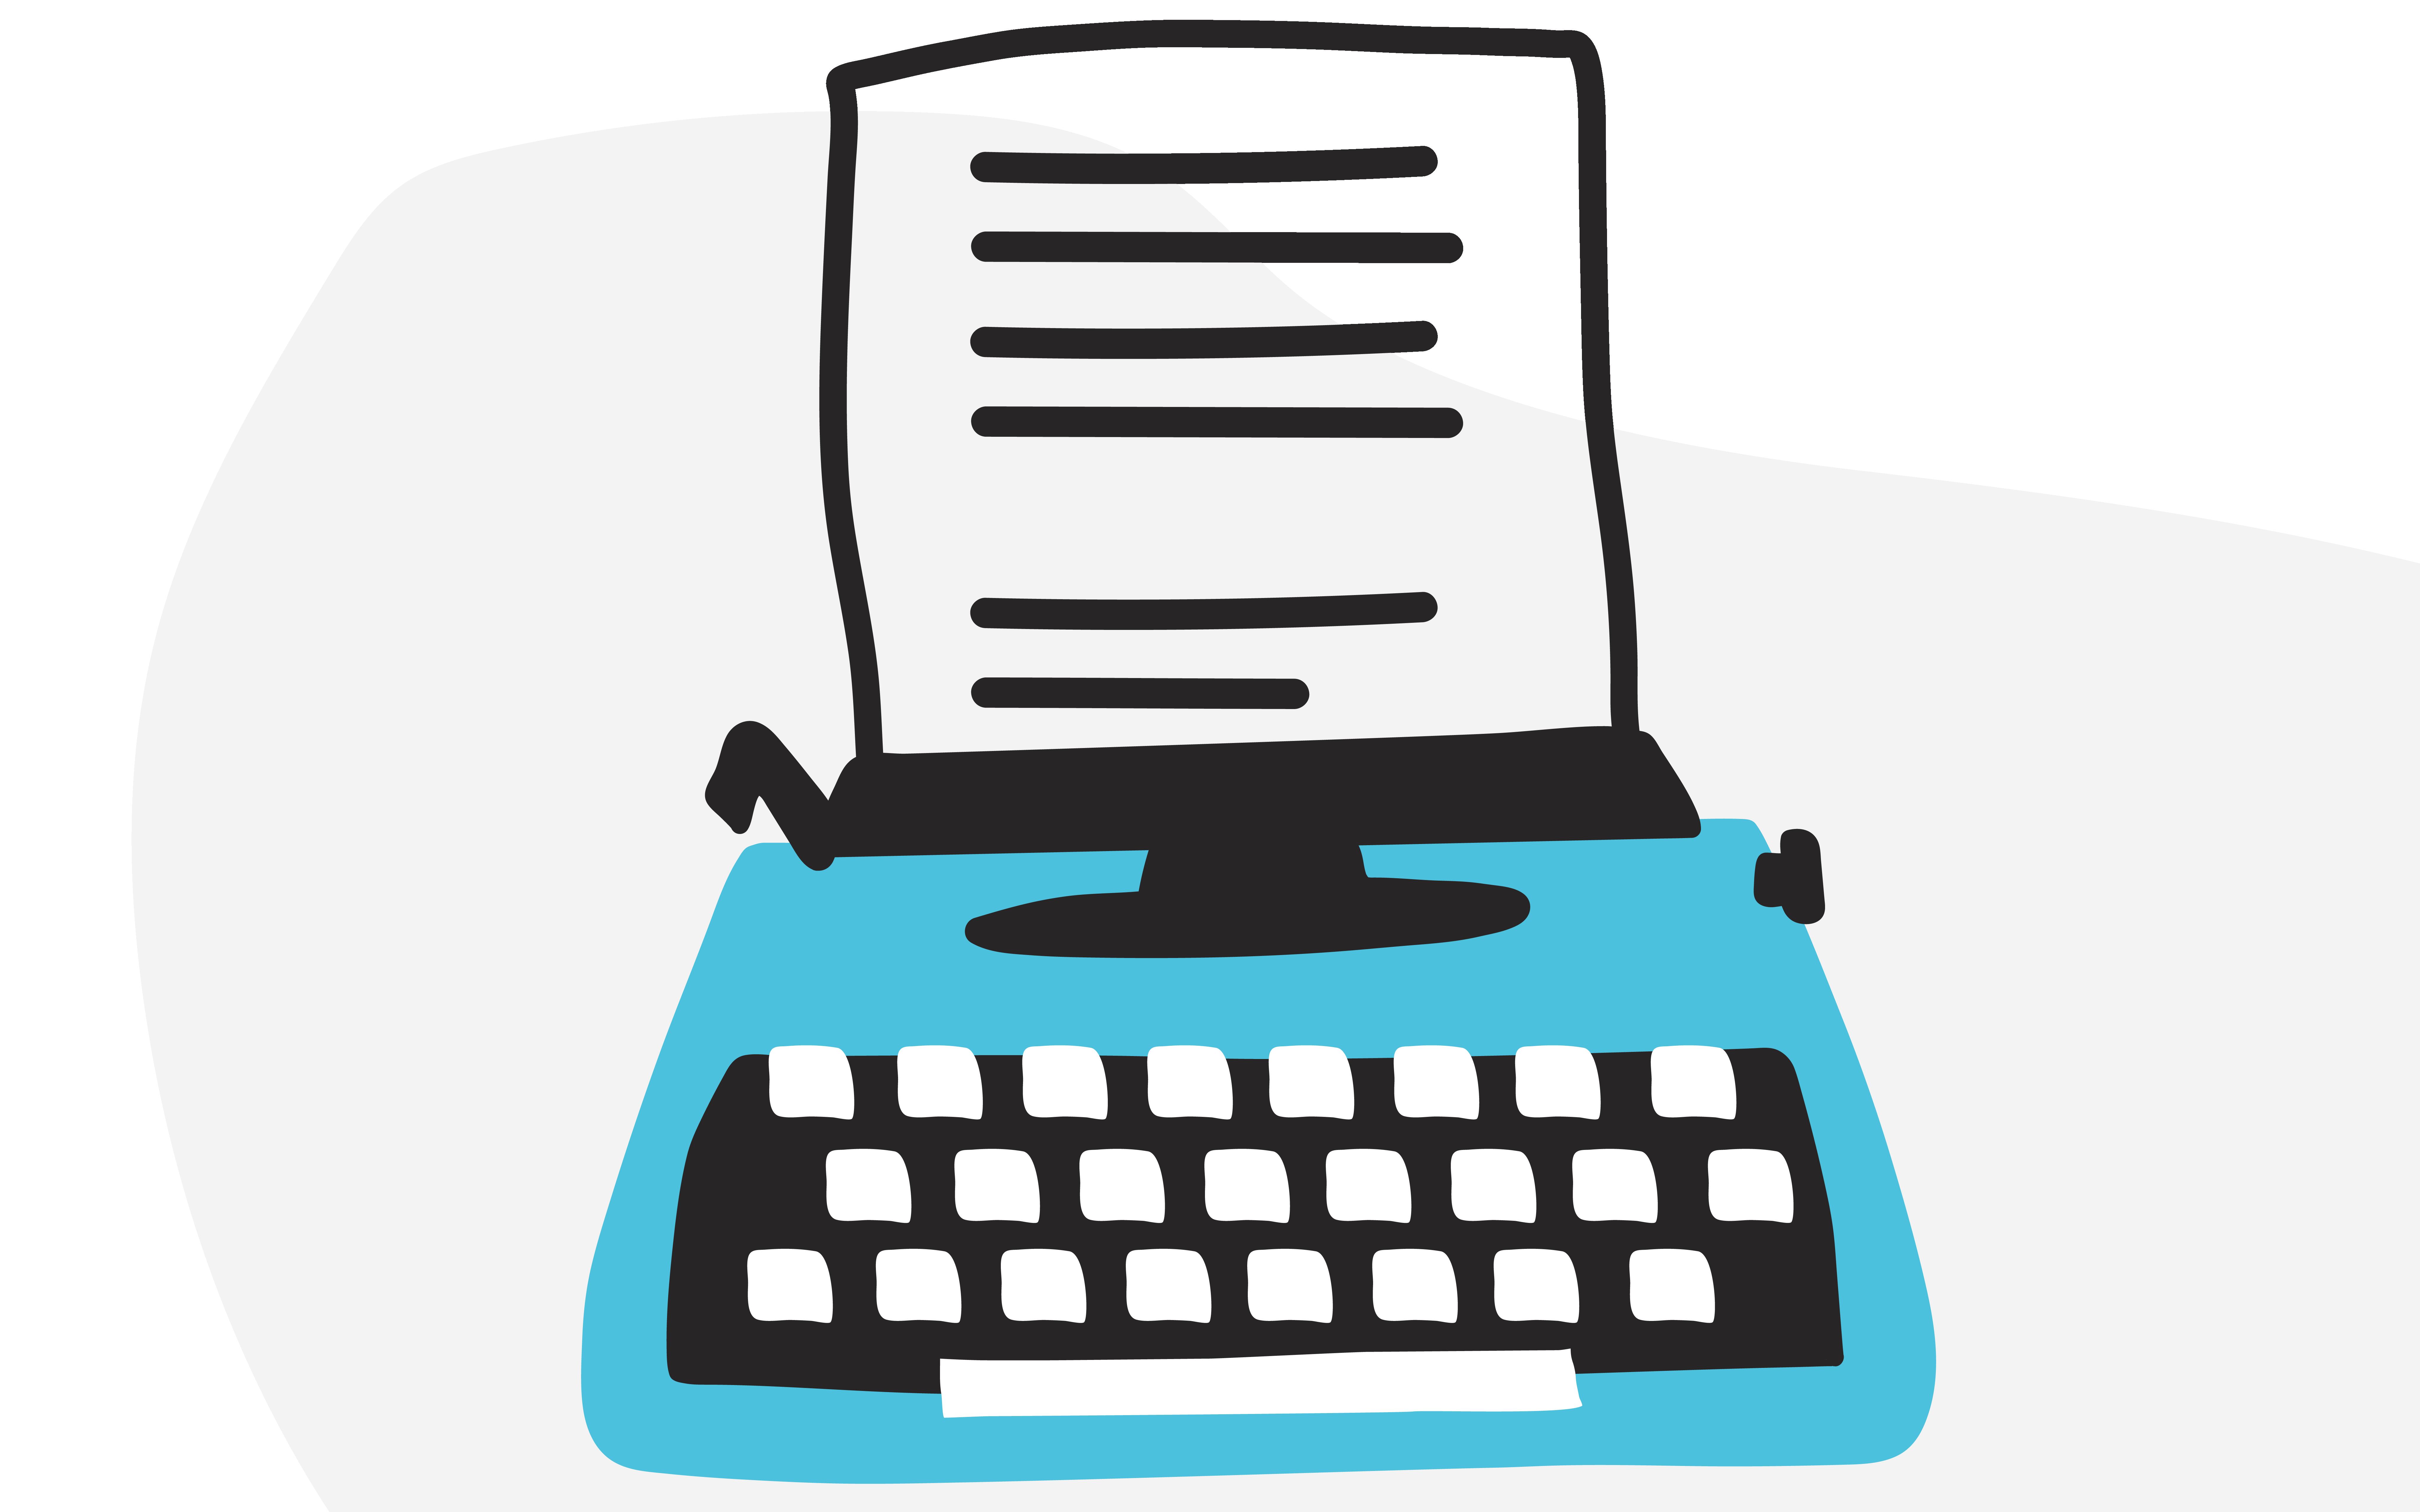 case study writing style